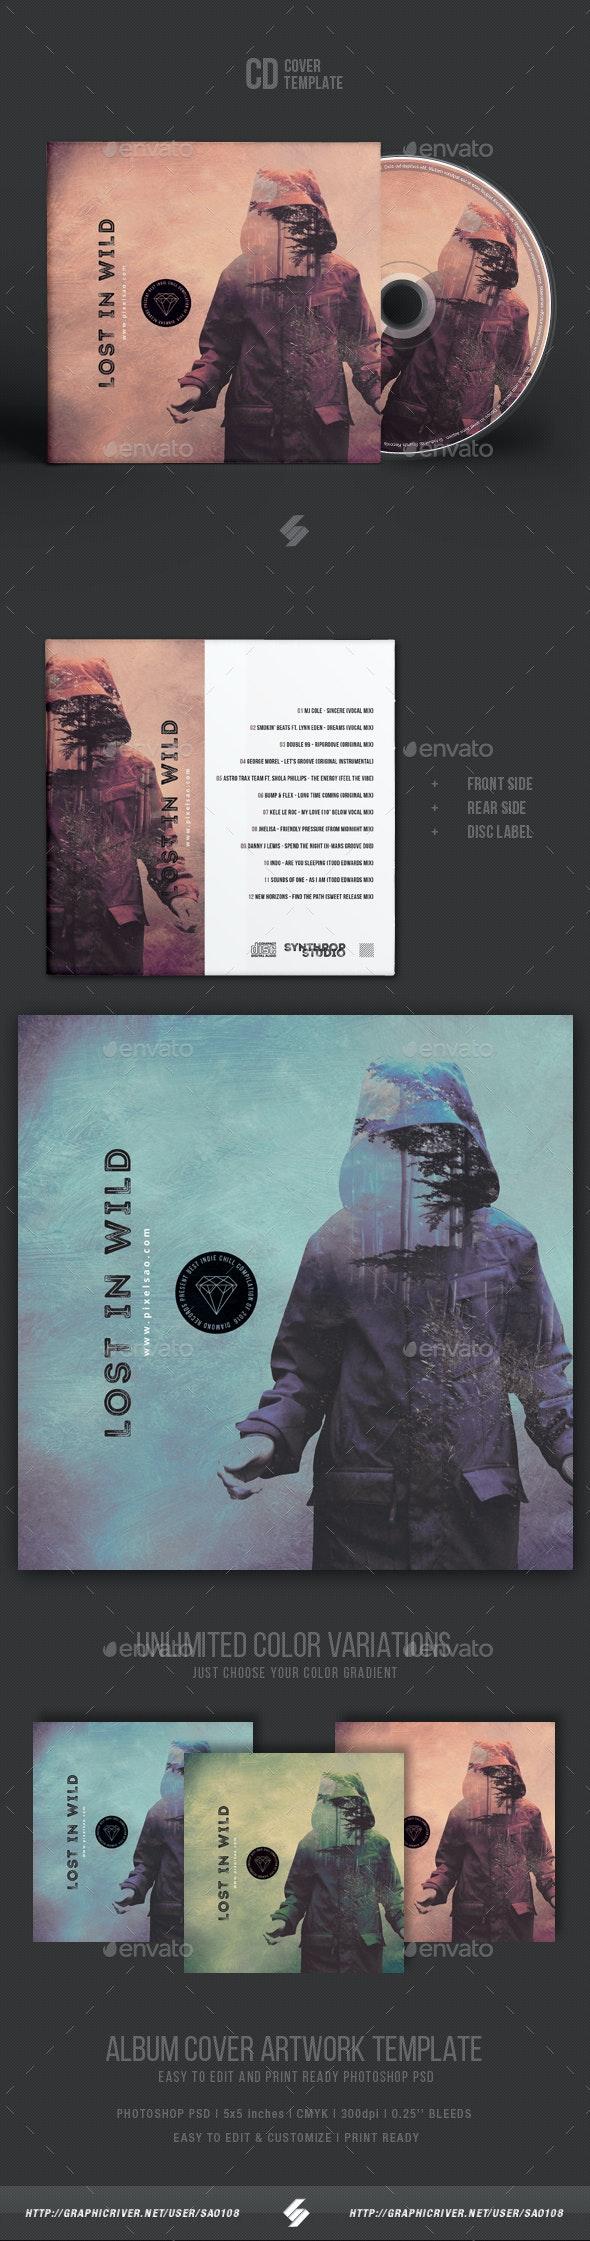 Lost in Wild - CD Cover Artwork Template - CD & DVD Artwork Print Templates